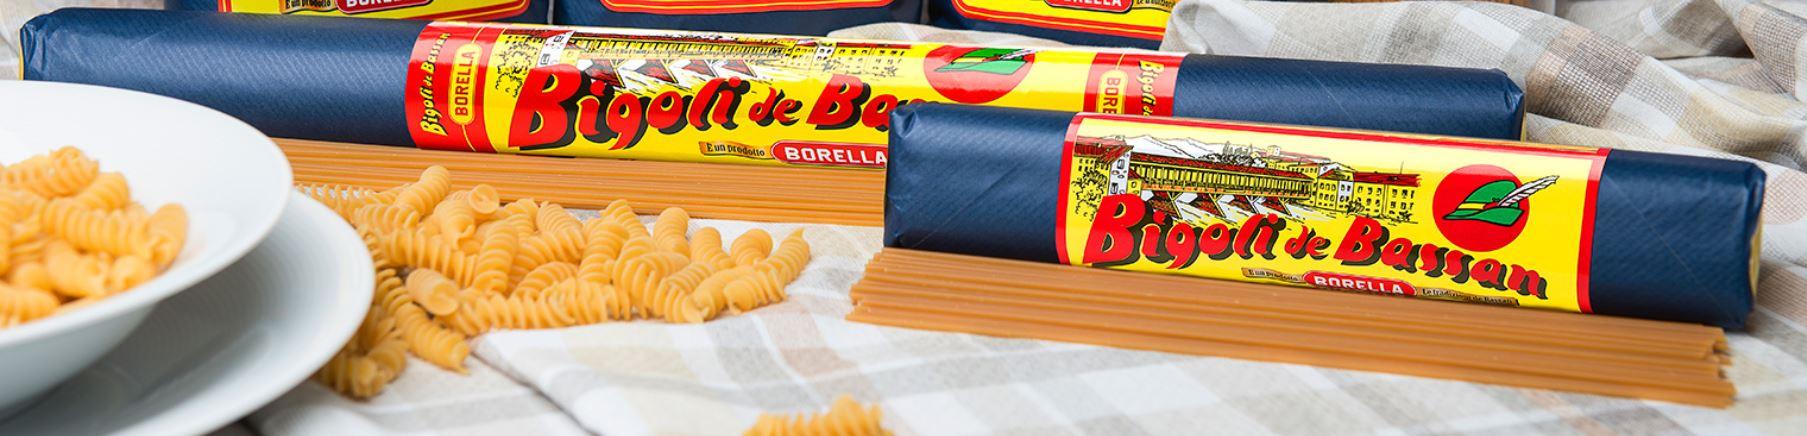 Borella banner